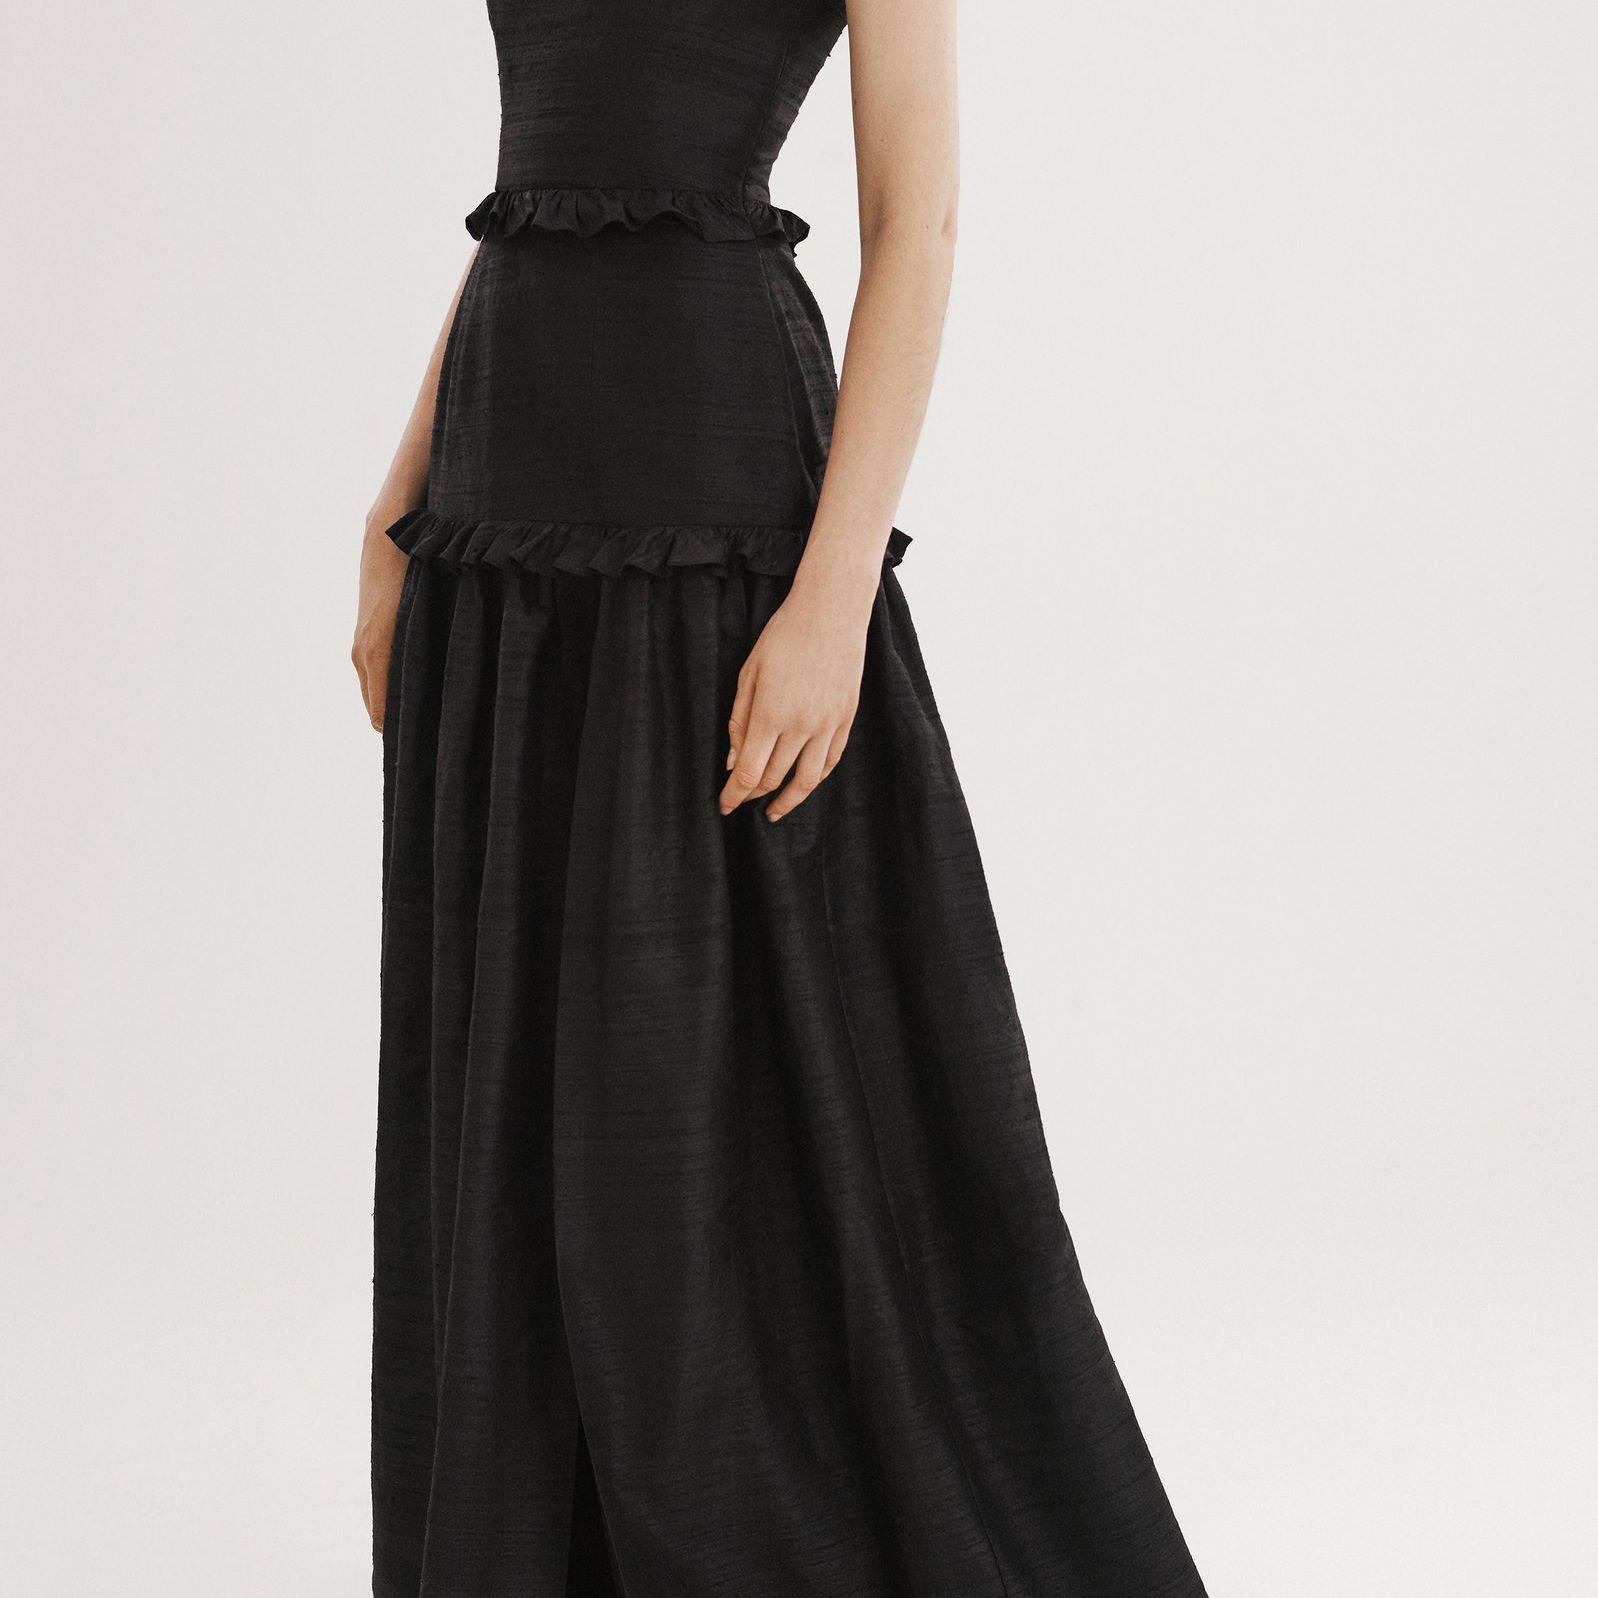 23 Best Black Wedding Dresses Of 2021